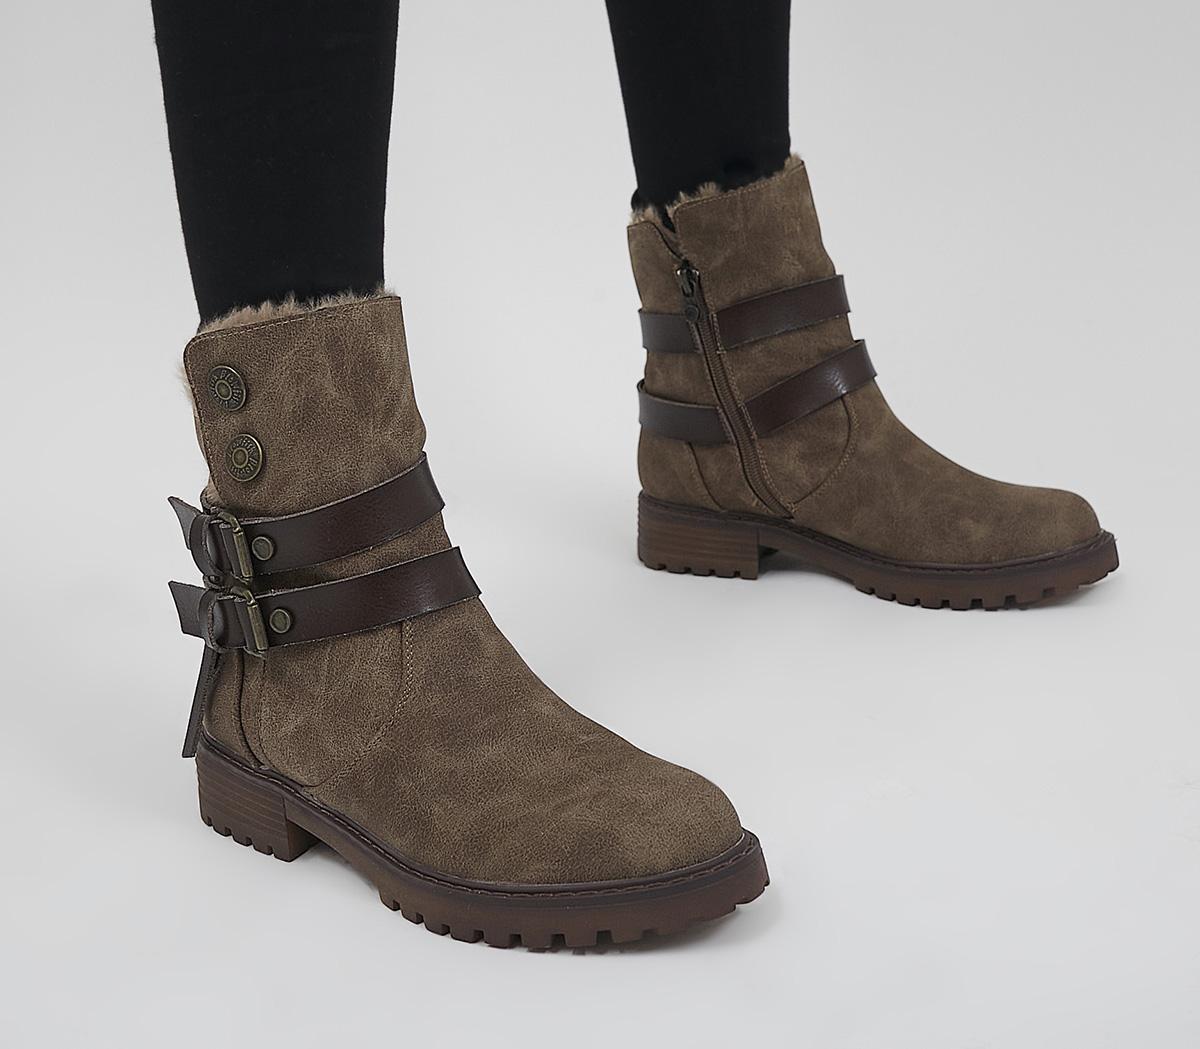 Ratlif Shr Boots